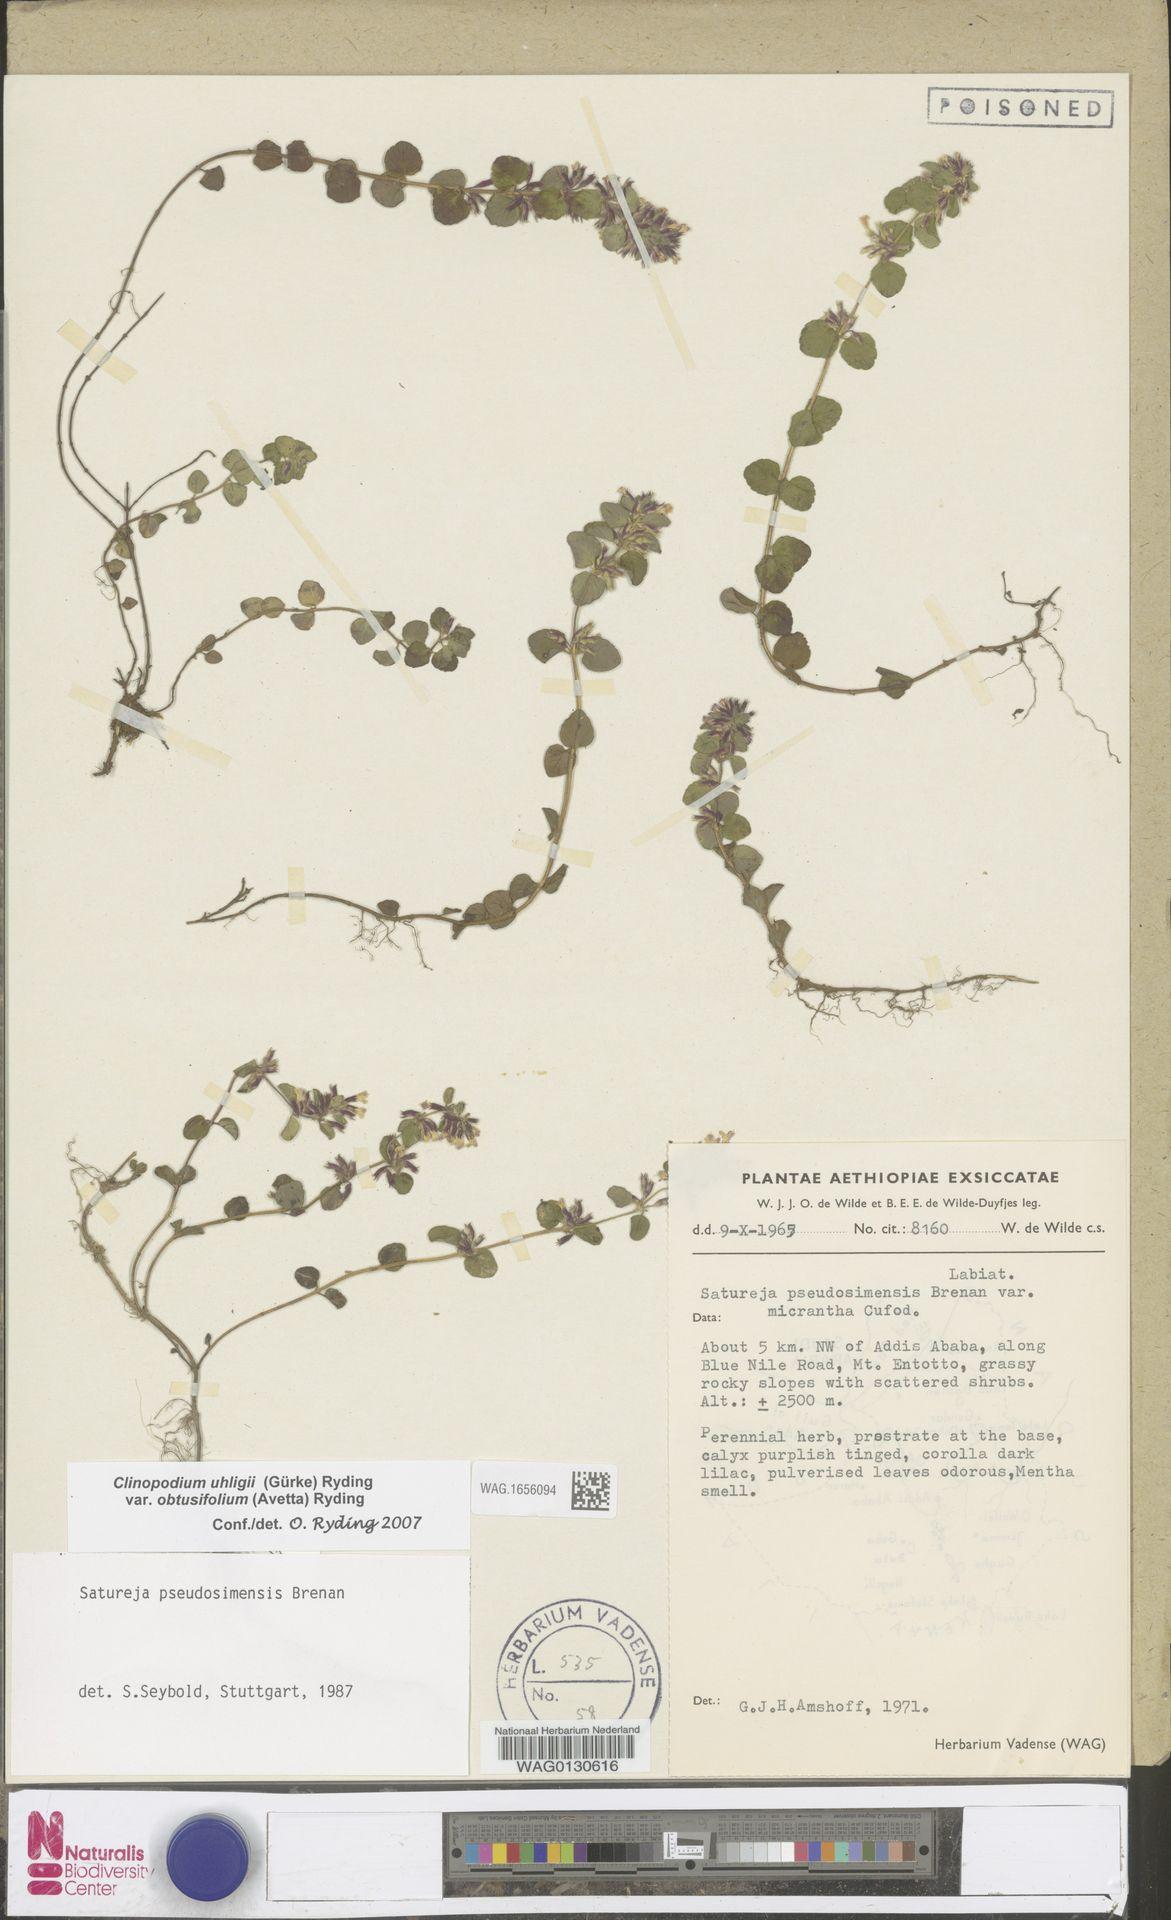 WAG.1656094 | Clinopodium uhligii var. obtusifolium (Avetta) Ryding